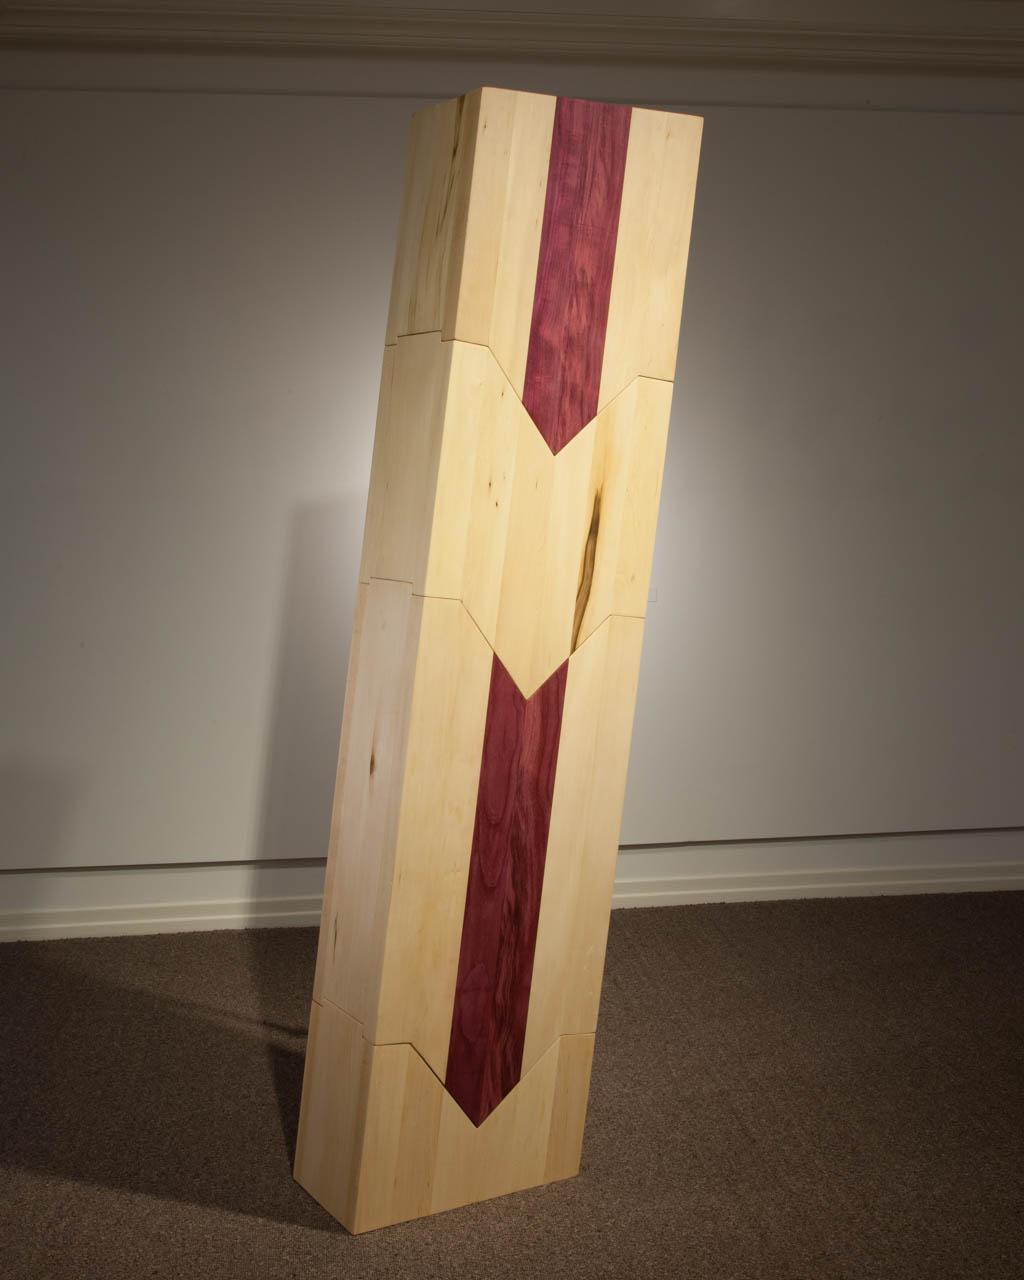 Totem for Diagonal Resistance, 2018